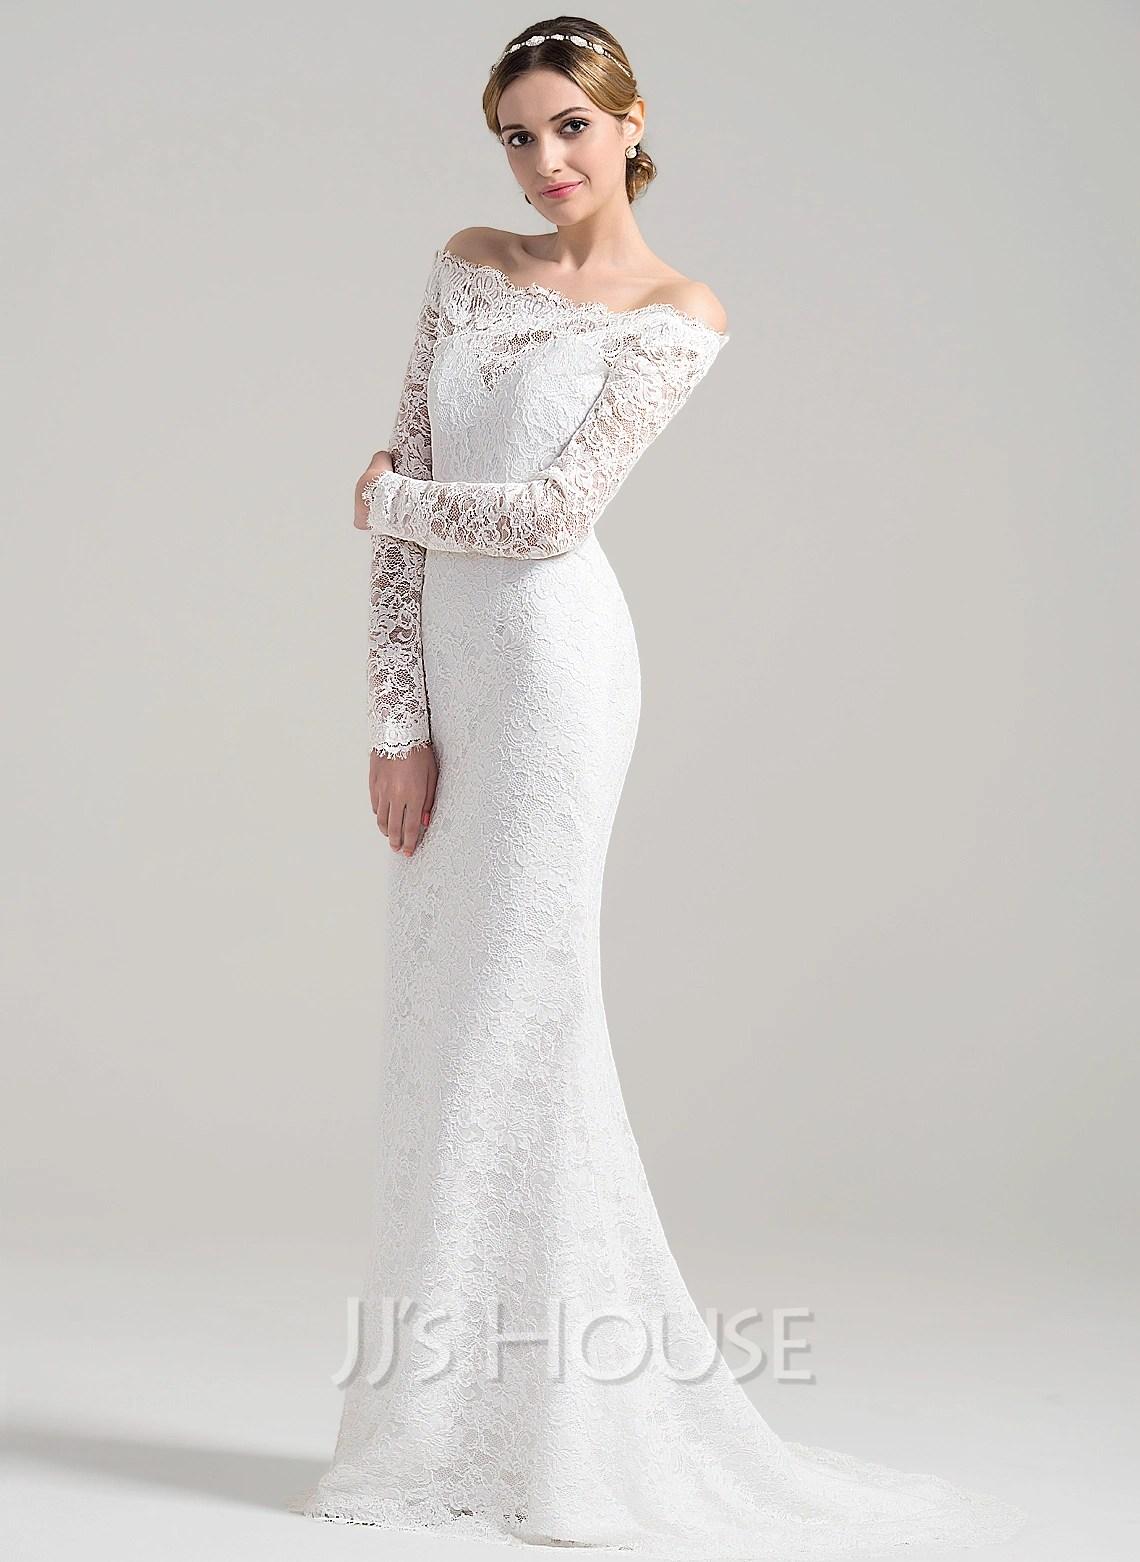 Beach p most popular wedding dresses Sheath Column Off the Shoulder Sweep Train Lace Wedding Dress